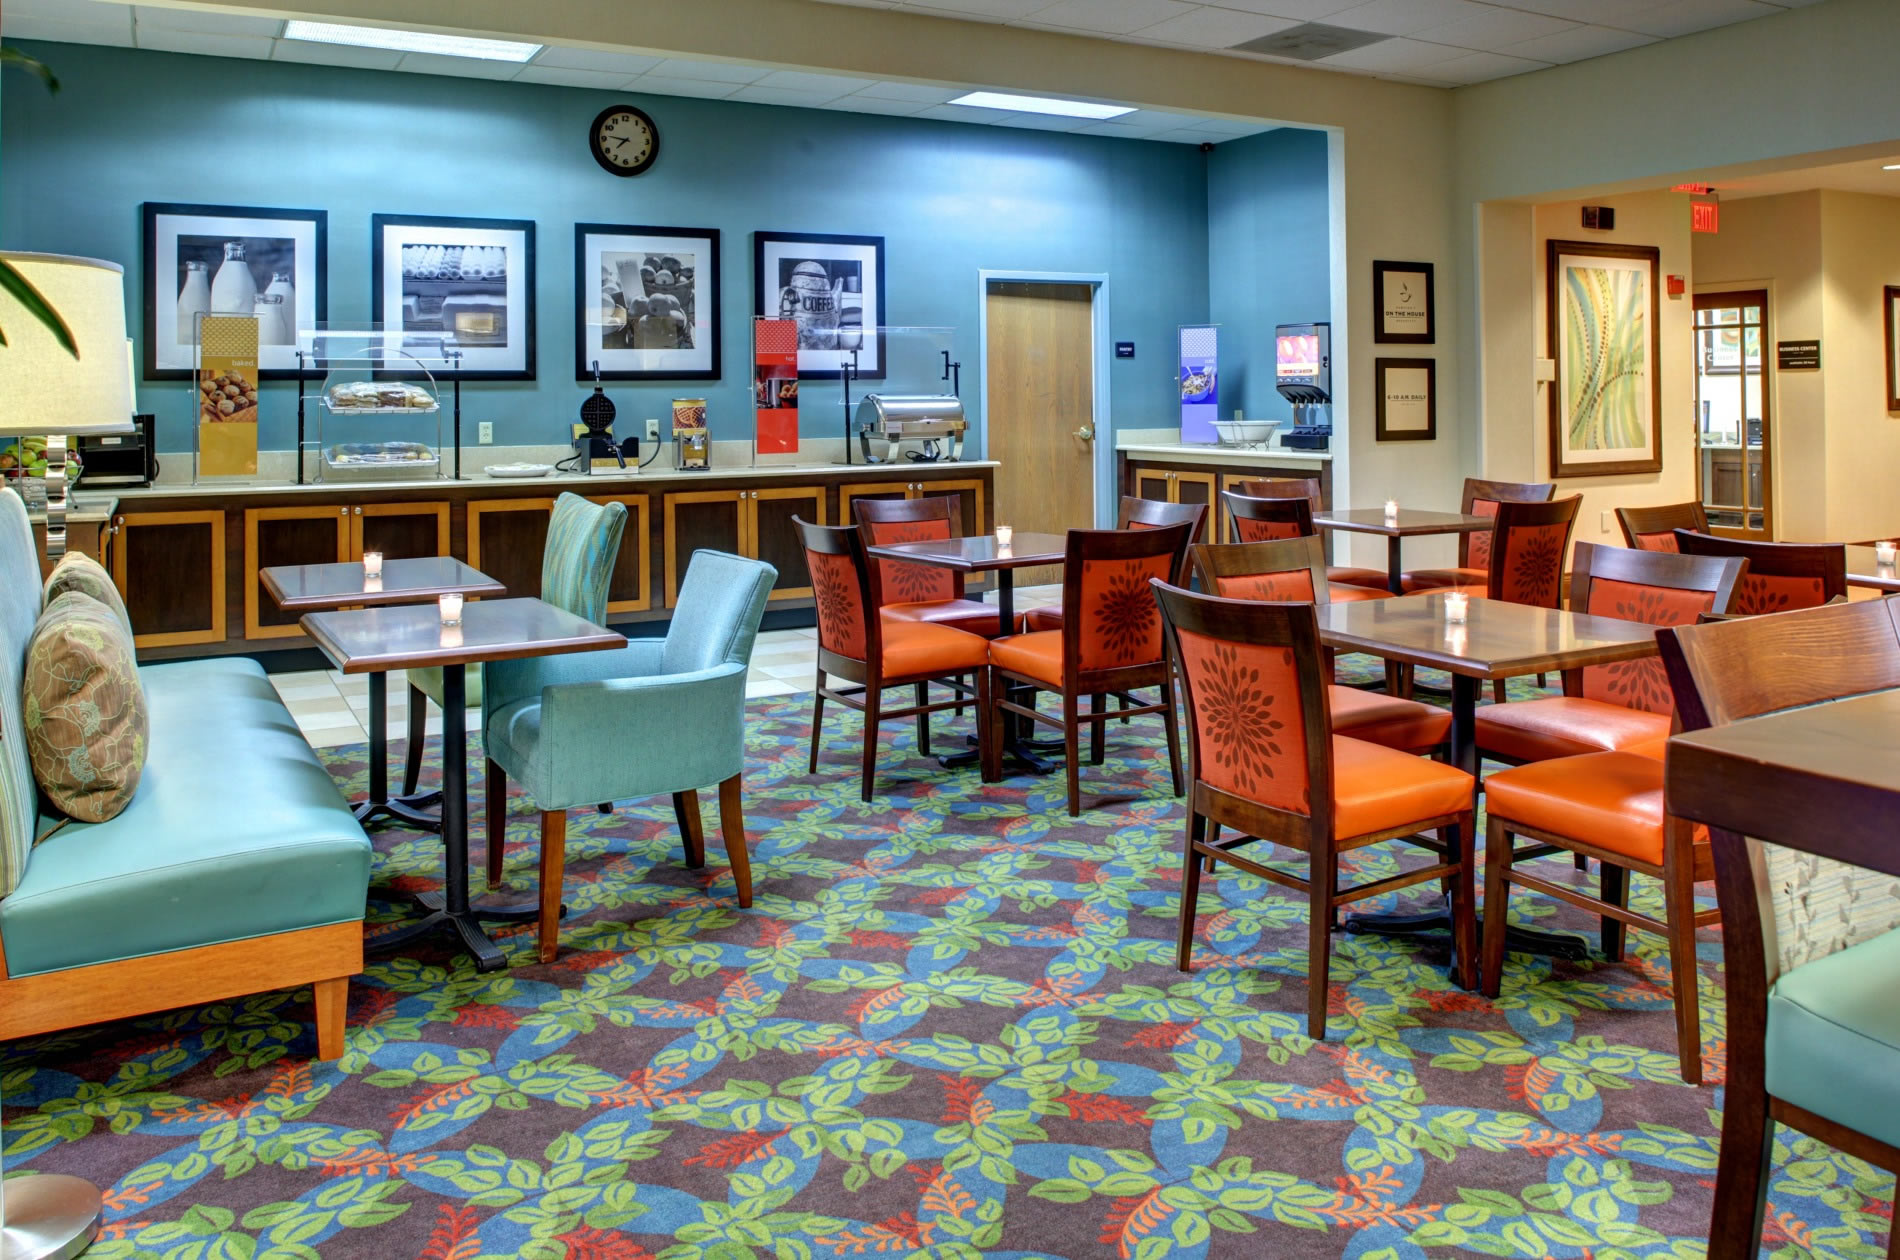 Hampton Inn by Hilton Pembroke Pines - Fort Lauderdale West image 3